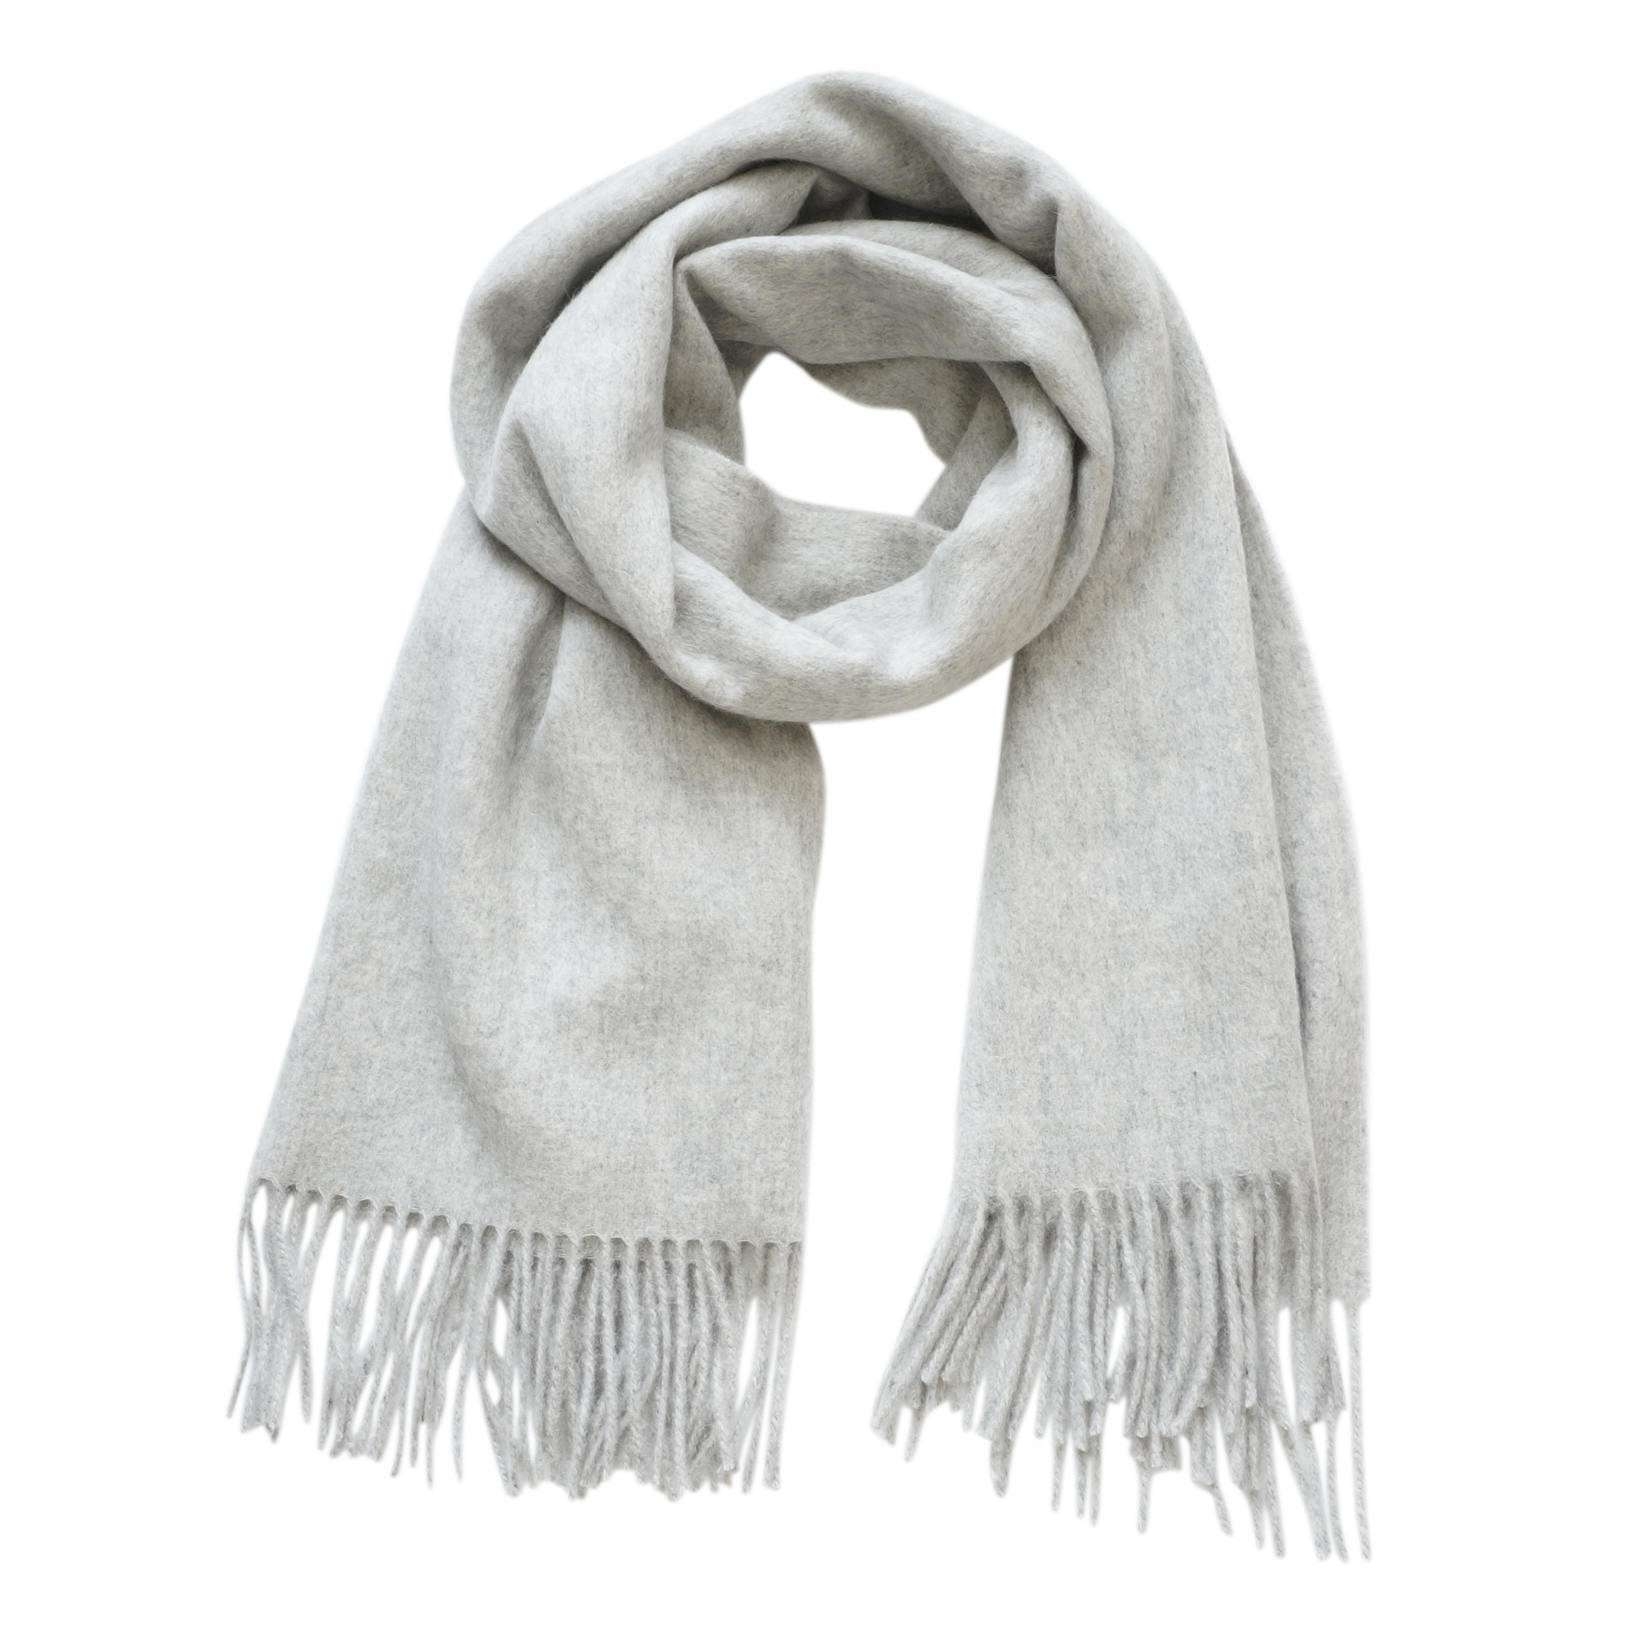 Bufanda de lana con flecos